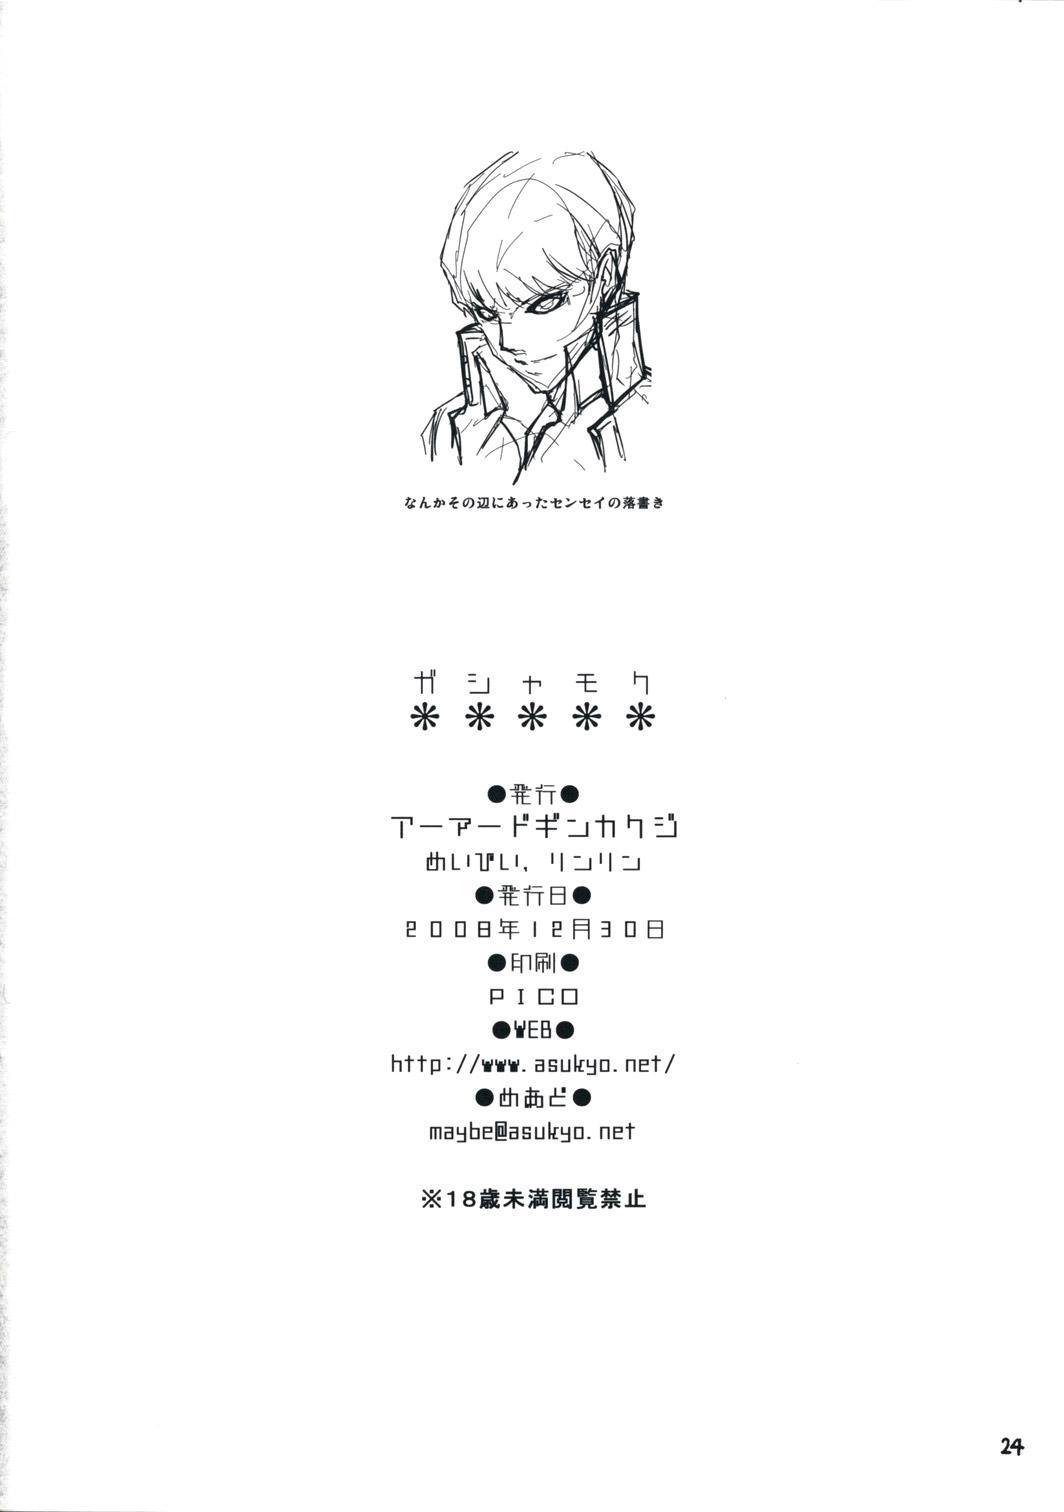 Gashamoku 24